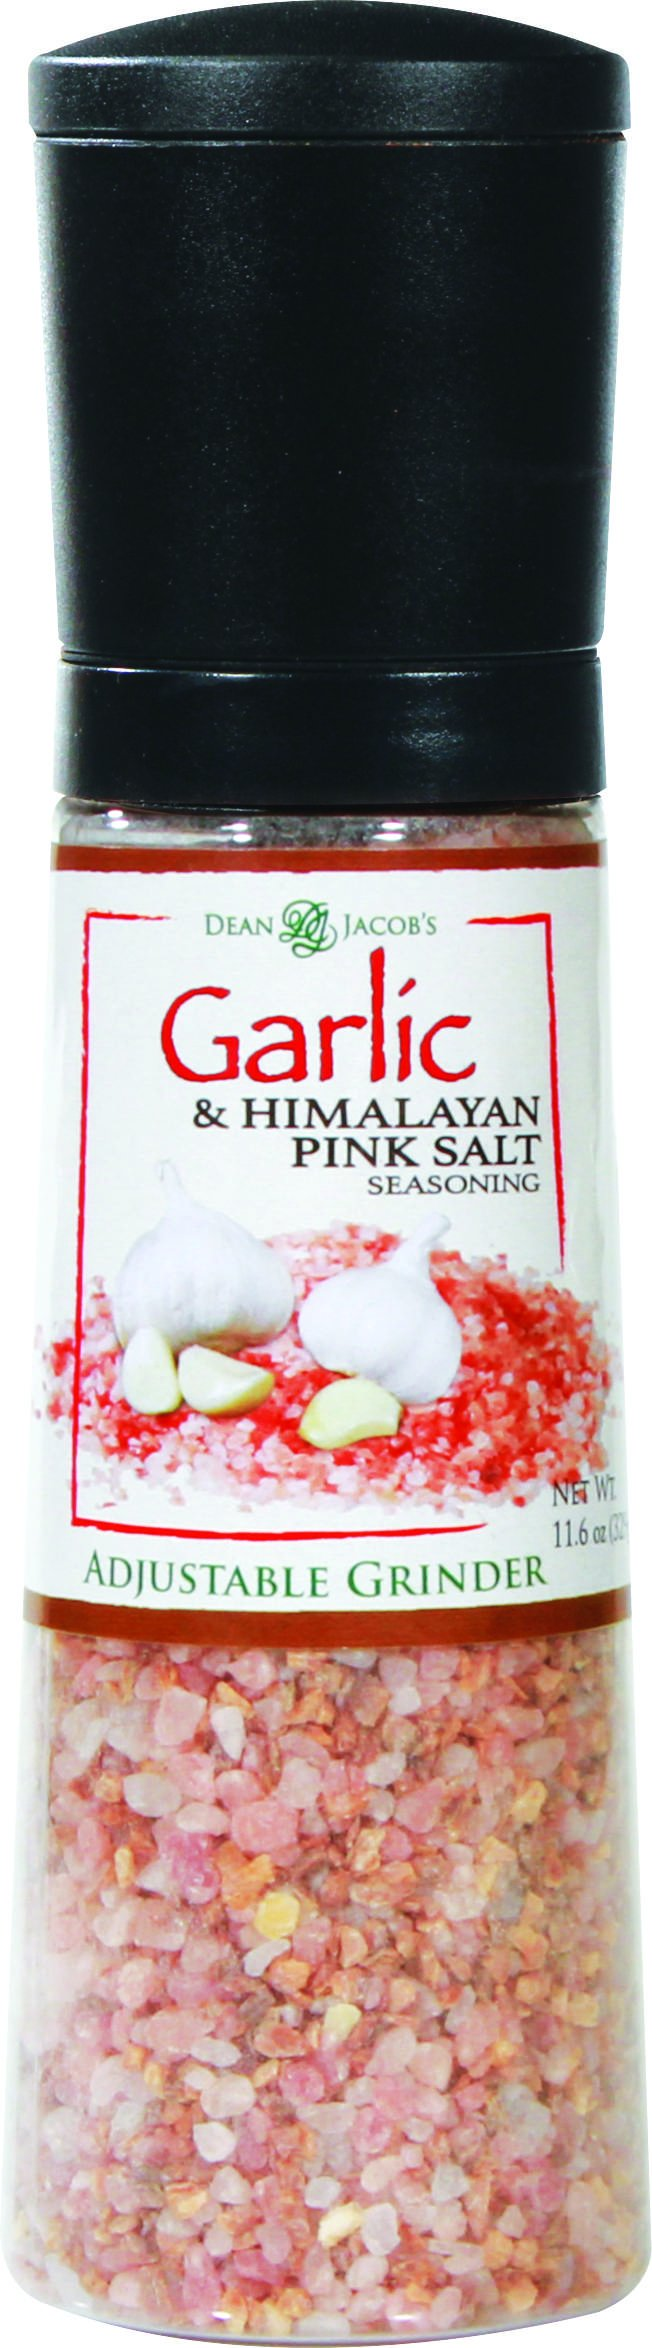 Dean Jacobs Jumbo Grinder, Roasted Garlic and Himalayan Pink Salt Seasoning, 11.6 Ounce